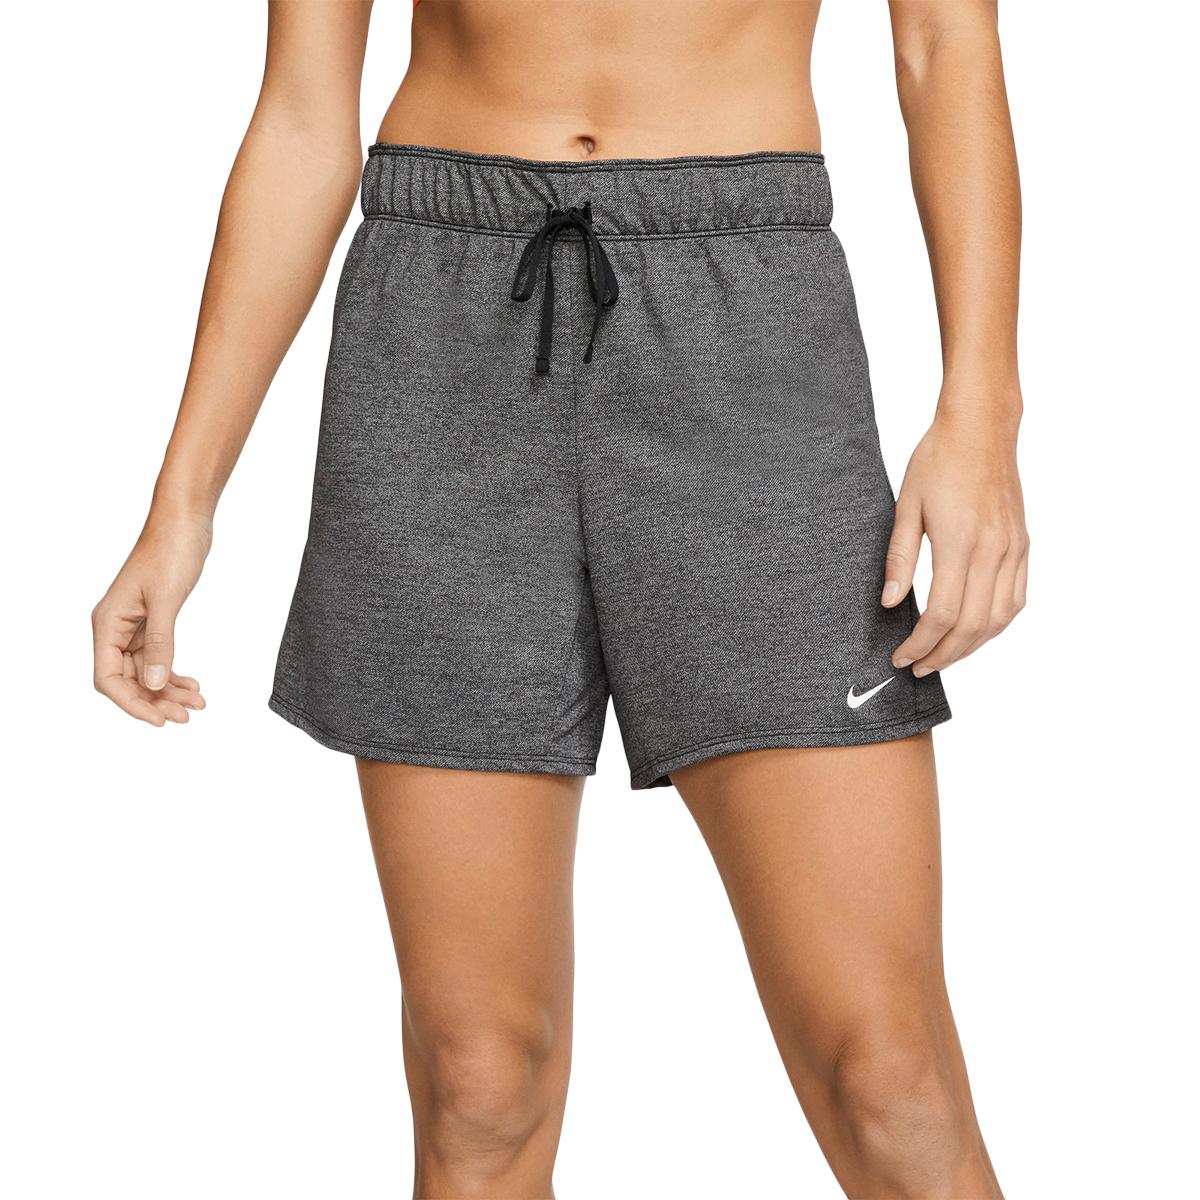 Nike Women's Dri-Fit Attack Training Short - Black, XL